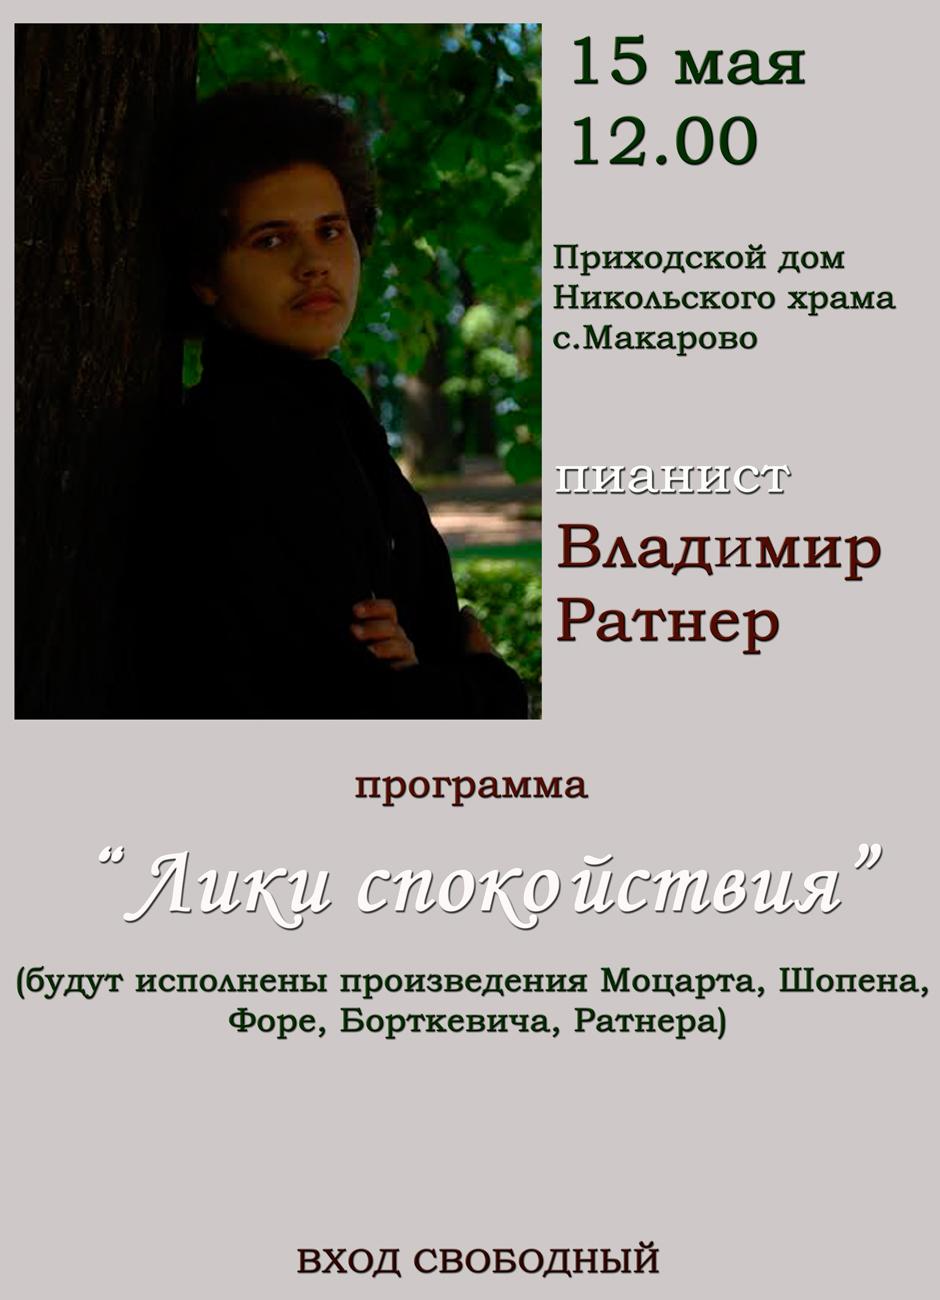 Концерт «Лики спокойствия» пианиста Владимира Ратнера